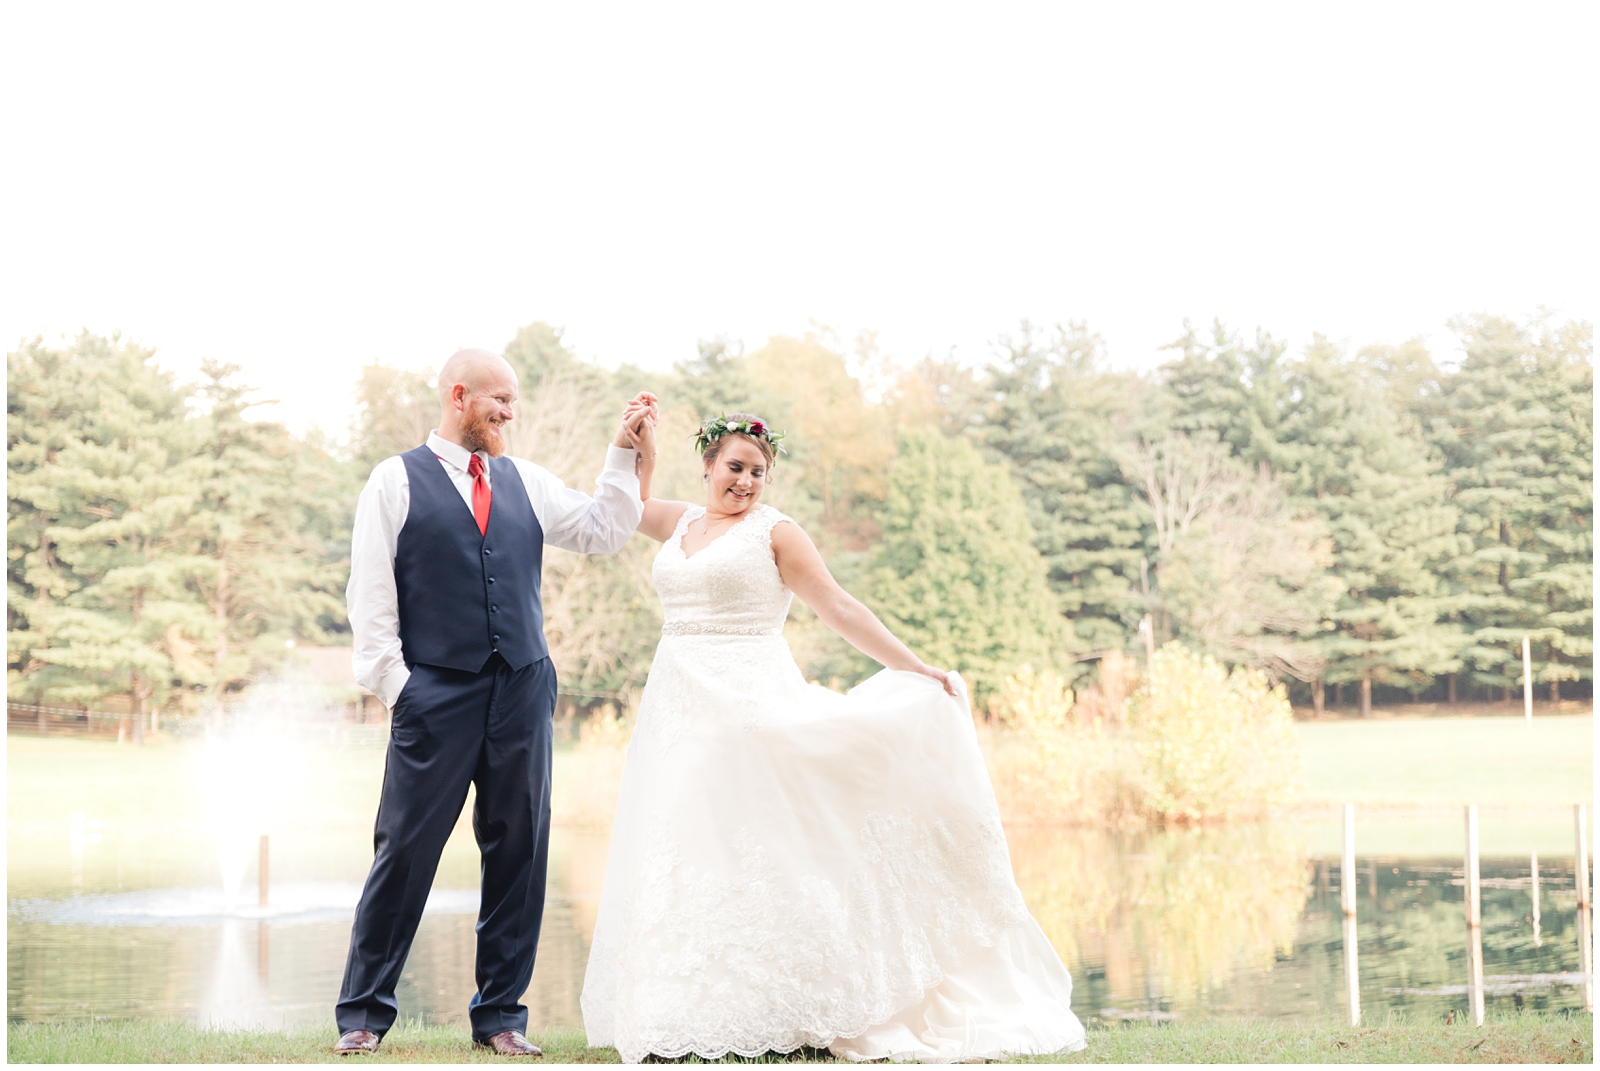 lancaster-ohio-fall-wedding-lra-photo_0019.jpg